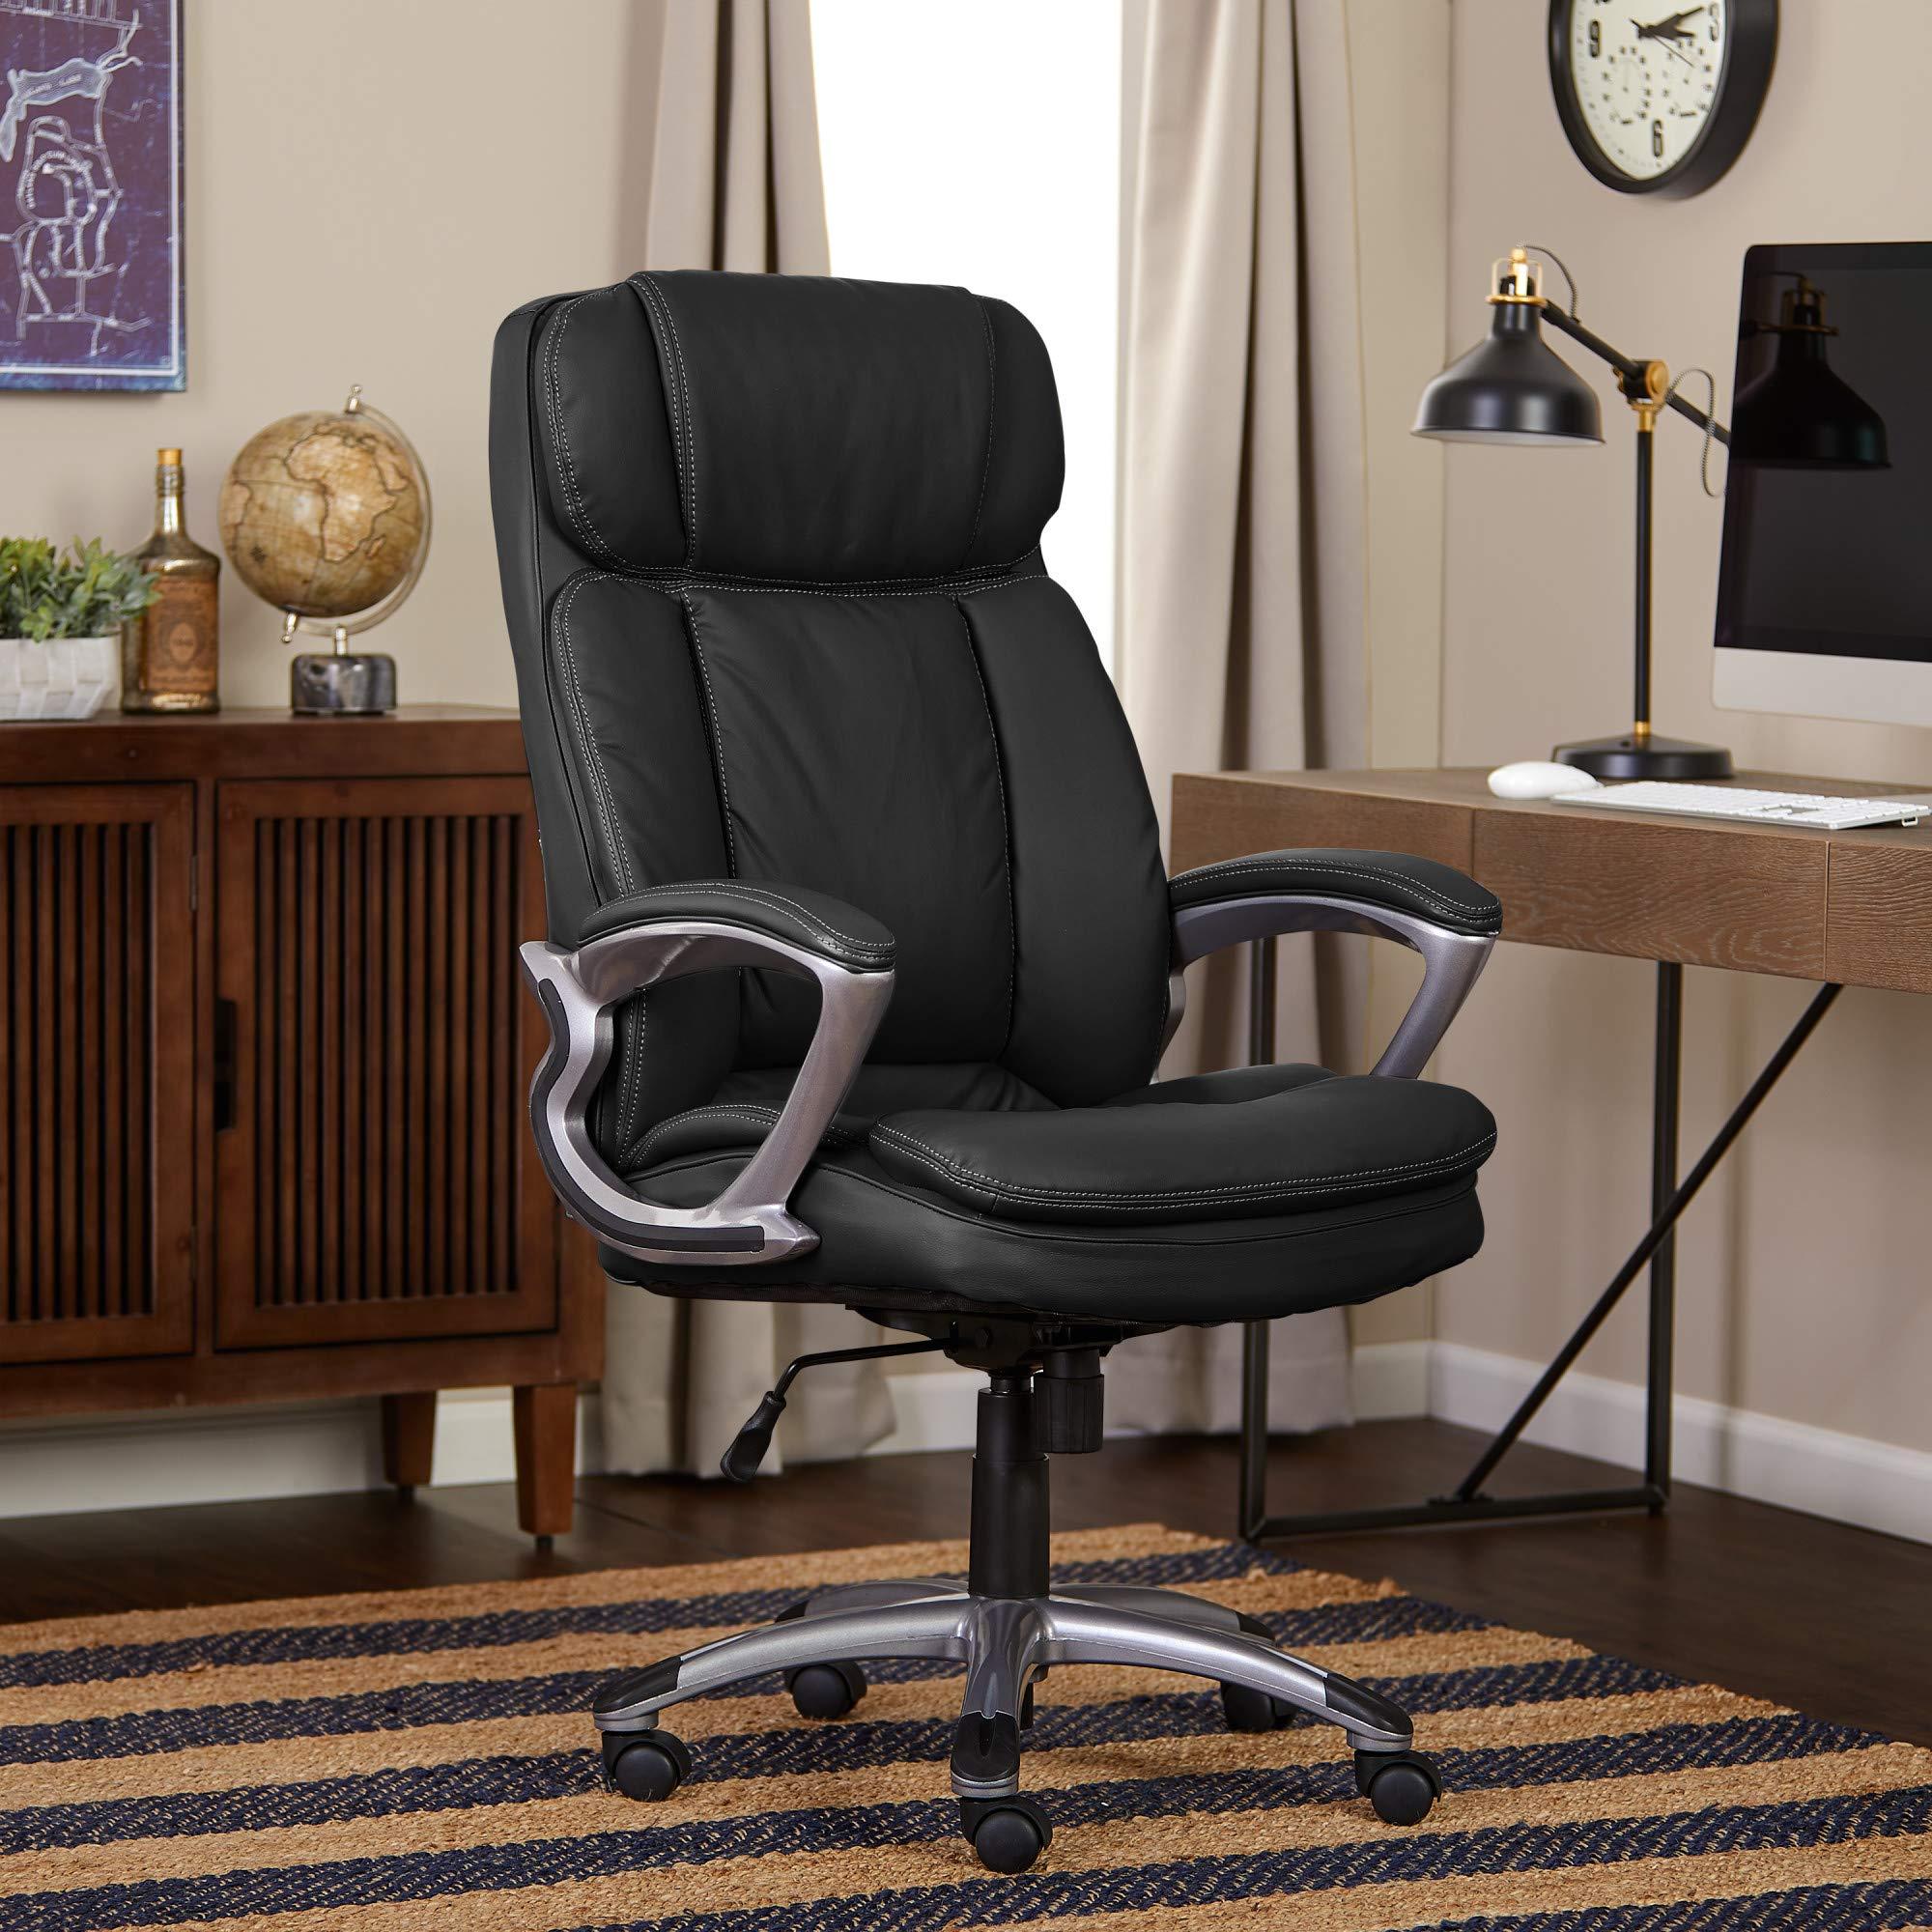 Serta Faux Leather Big & Tall Executive Chair, Black by Serta